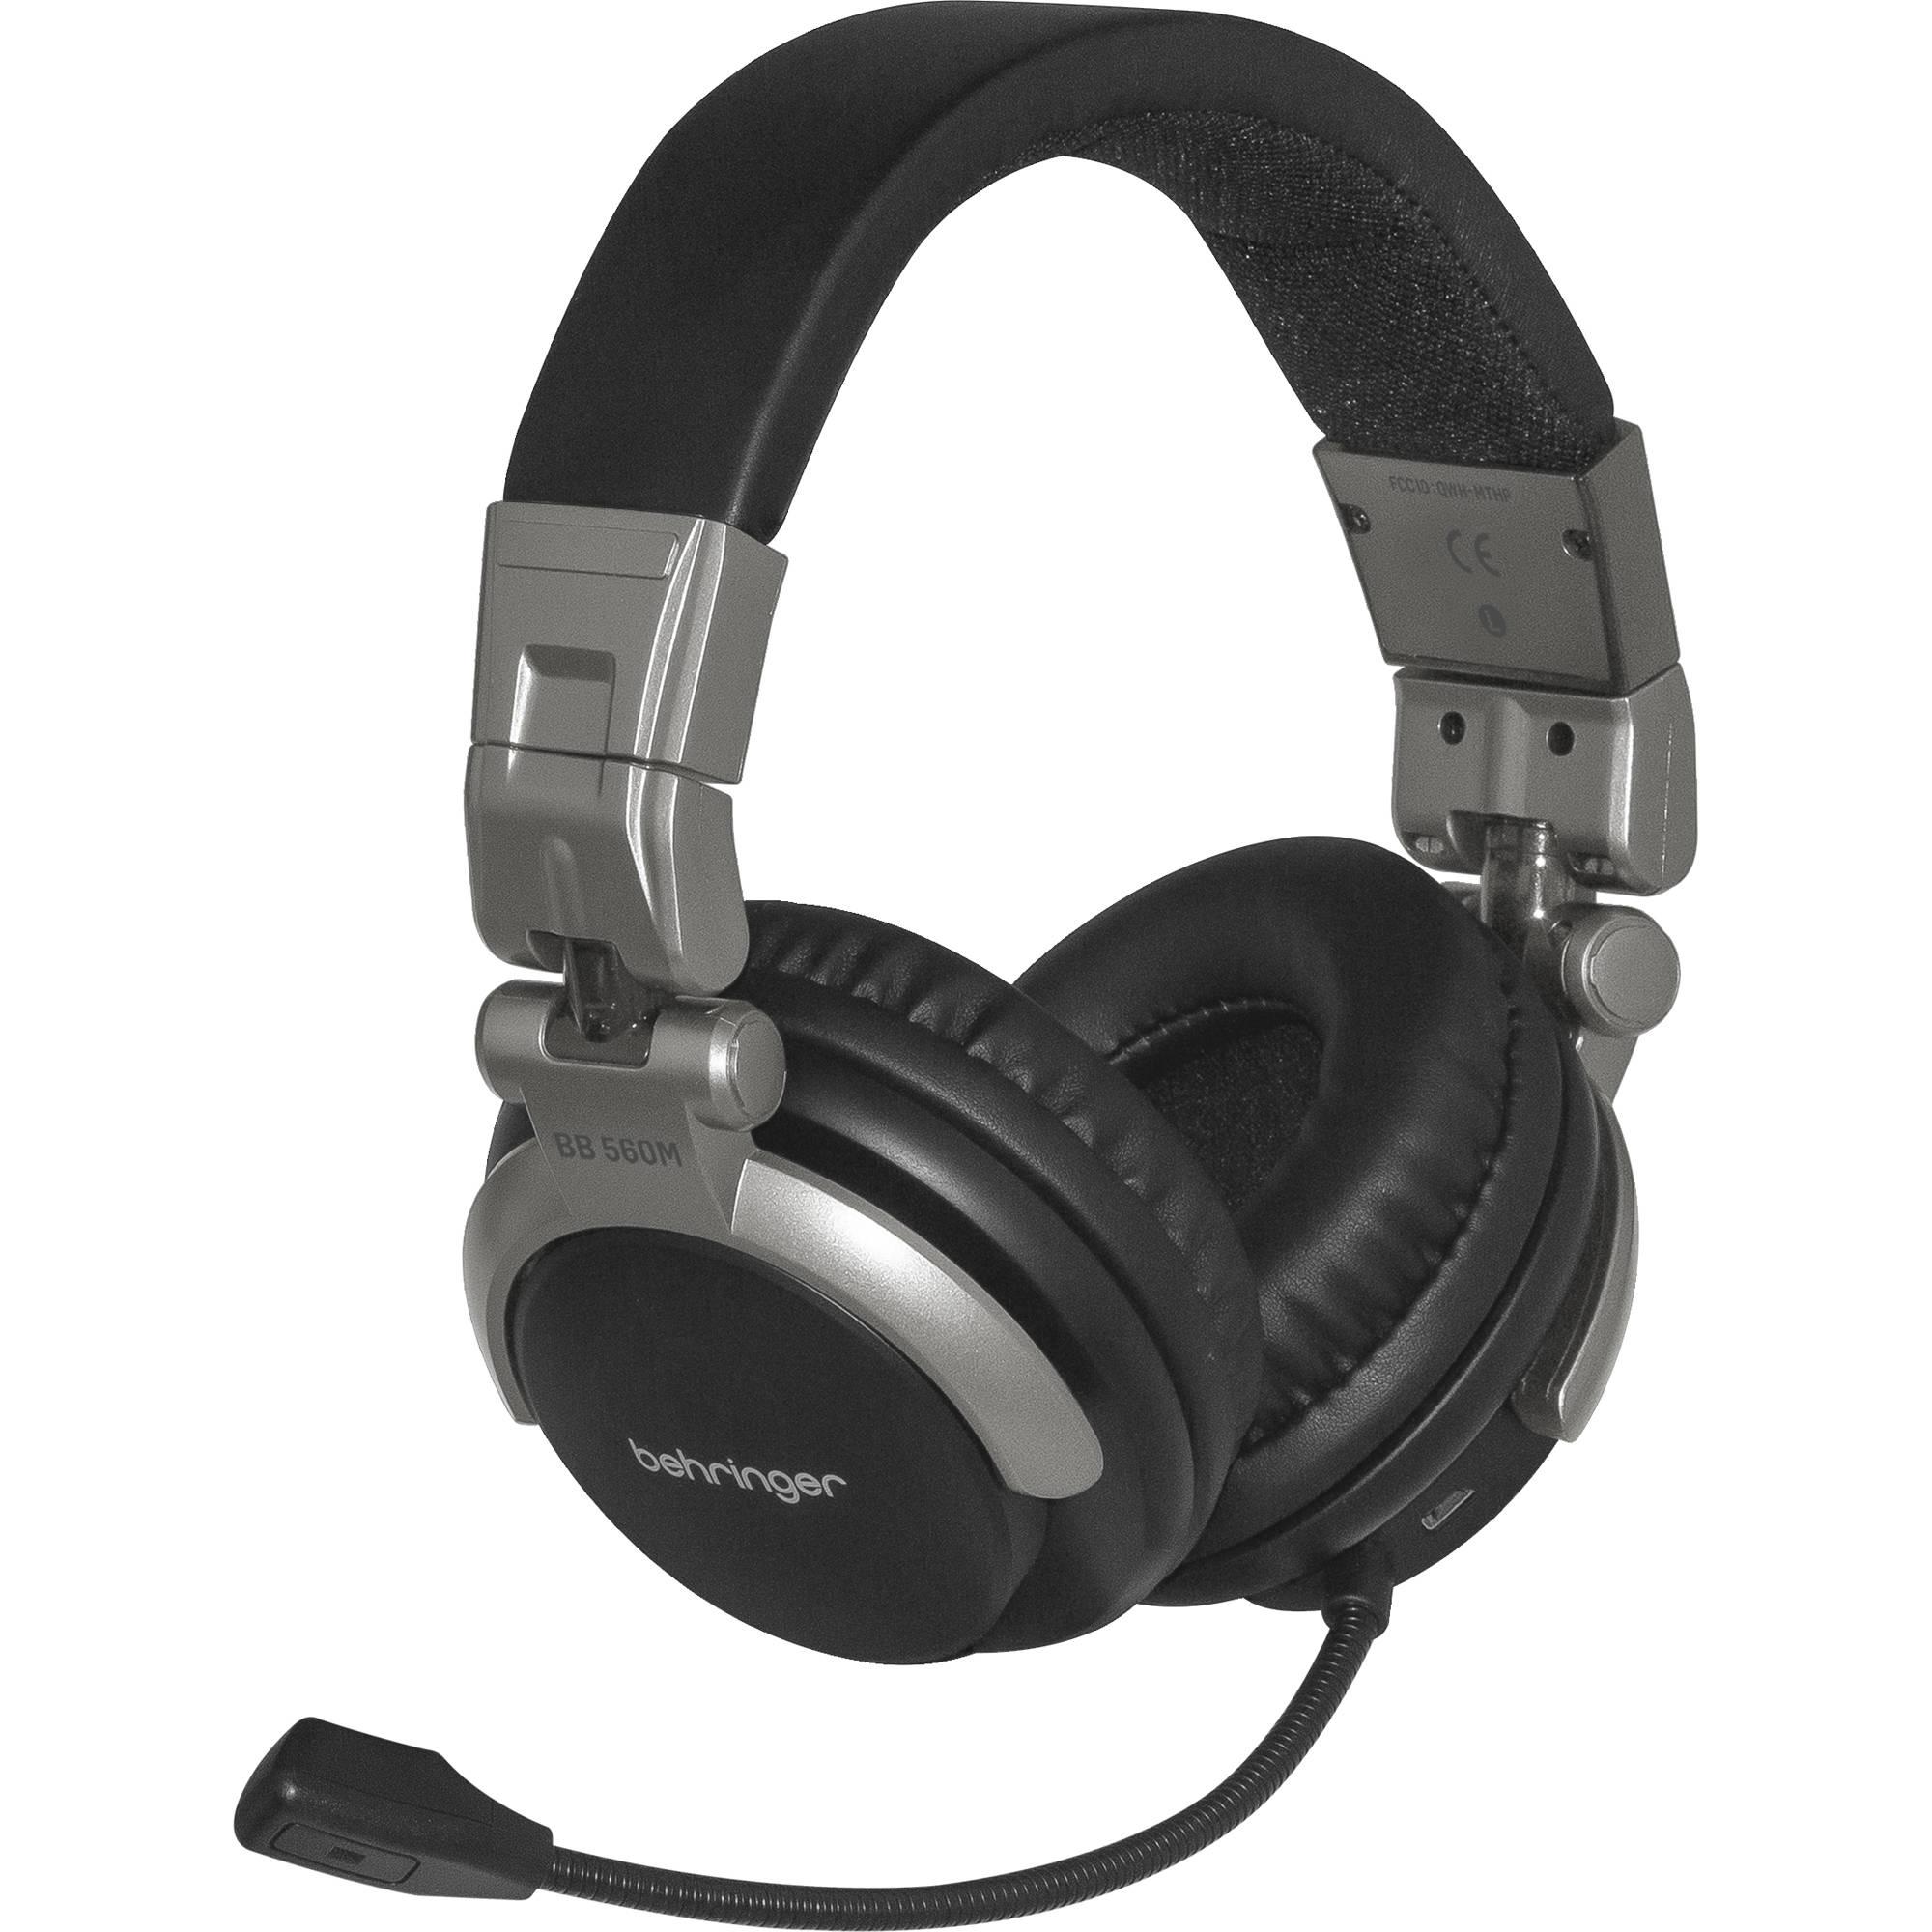 Behringer Bb 560m Bluetooth Headphones With Flexible Boom Bb560m